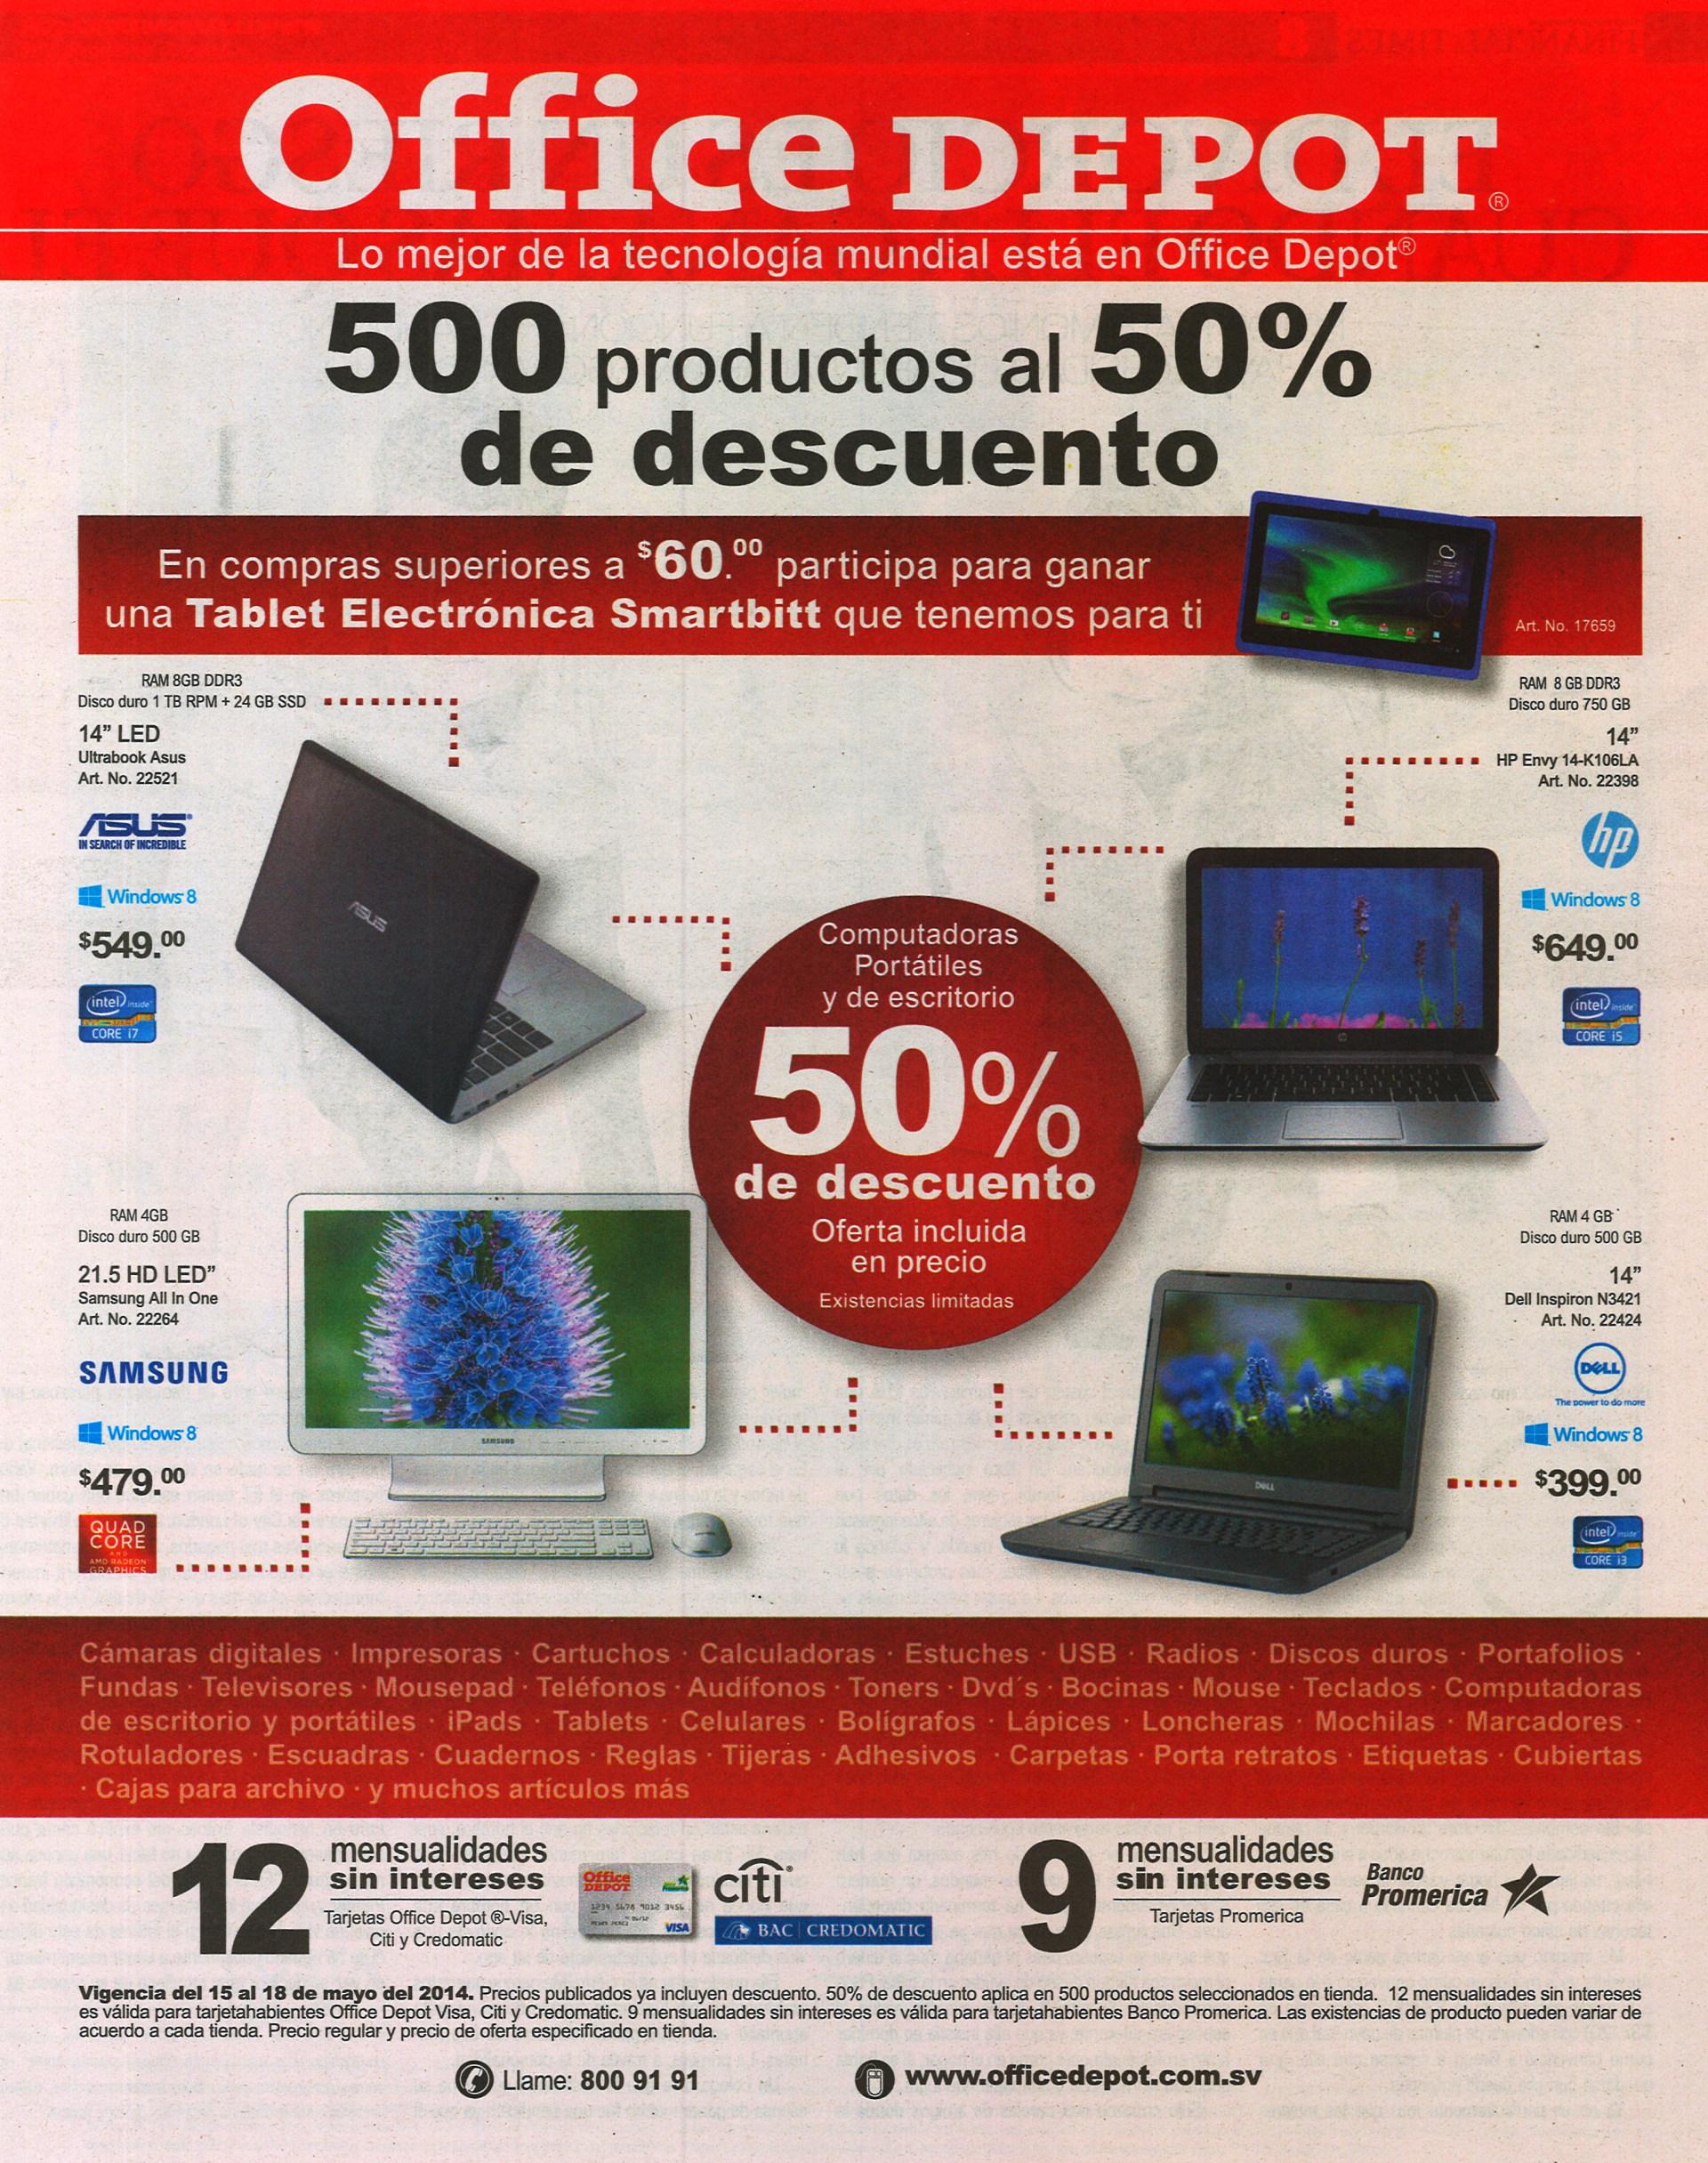 Office depot 500 productos al 50 off de descuento for Home depot productos